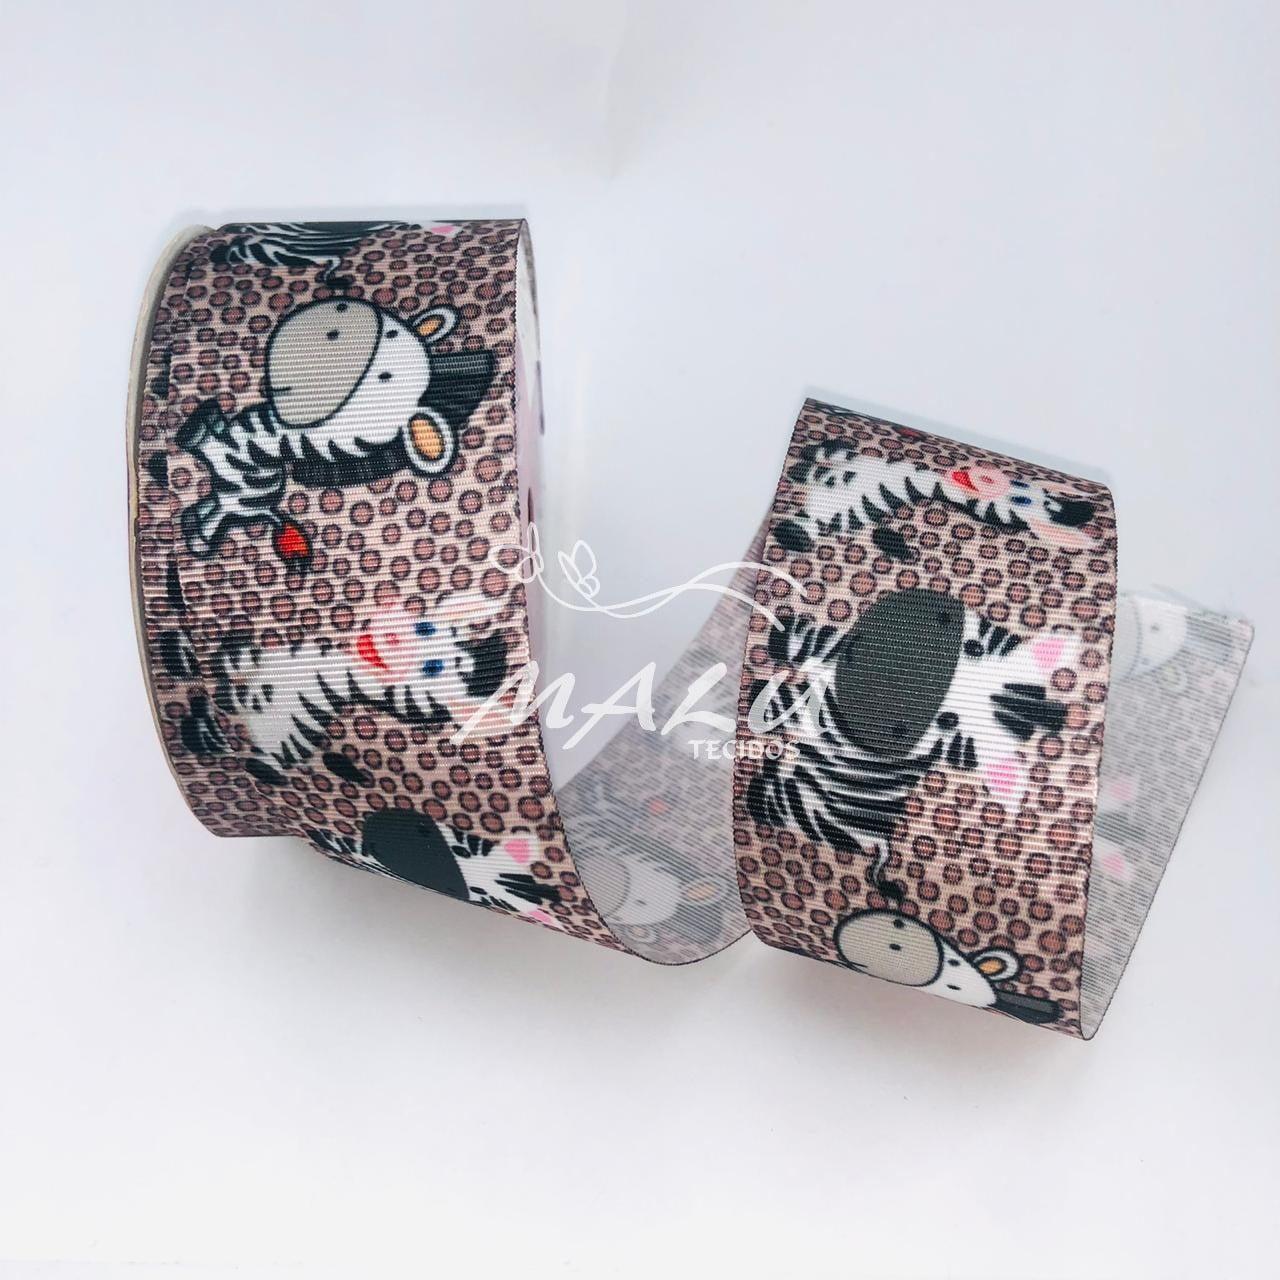 Fita Gorgurão Estampada Zebra N9 10mts